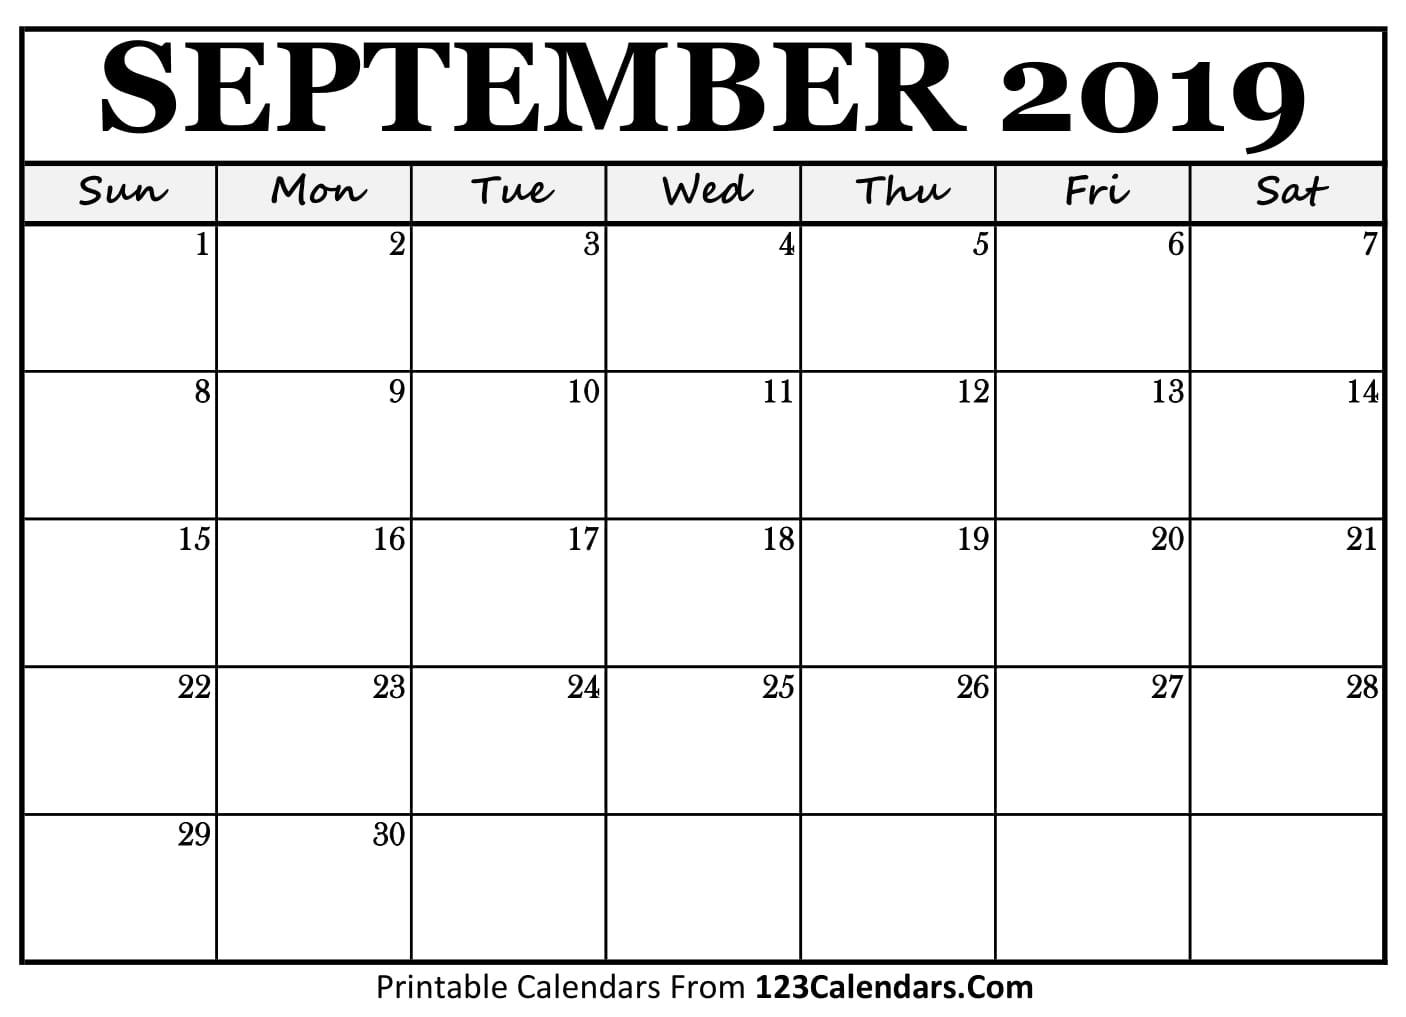 September Calendar Printables : Printable september calendar templates calendars